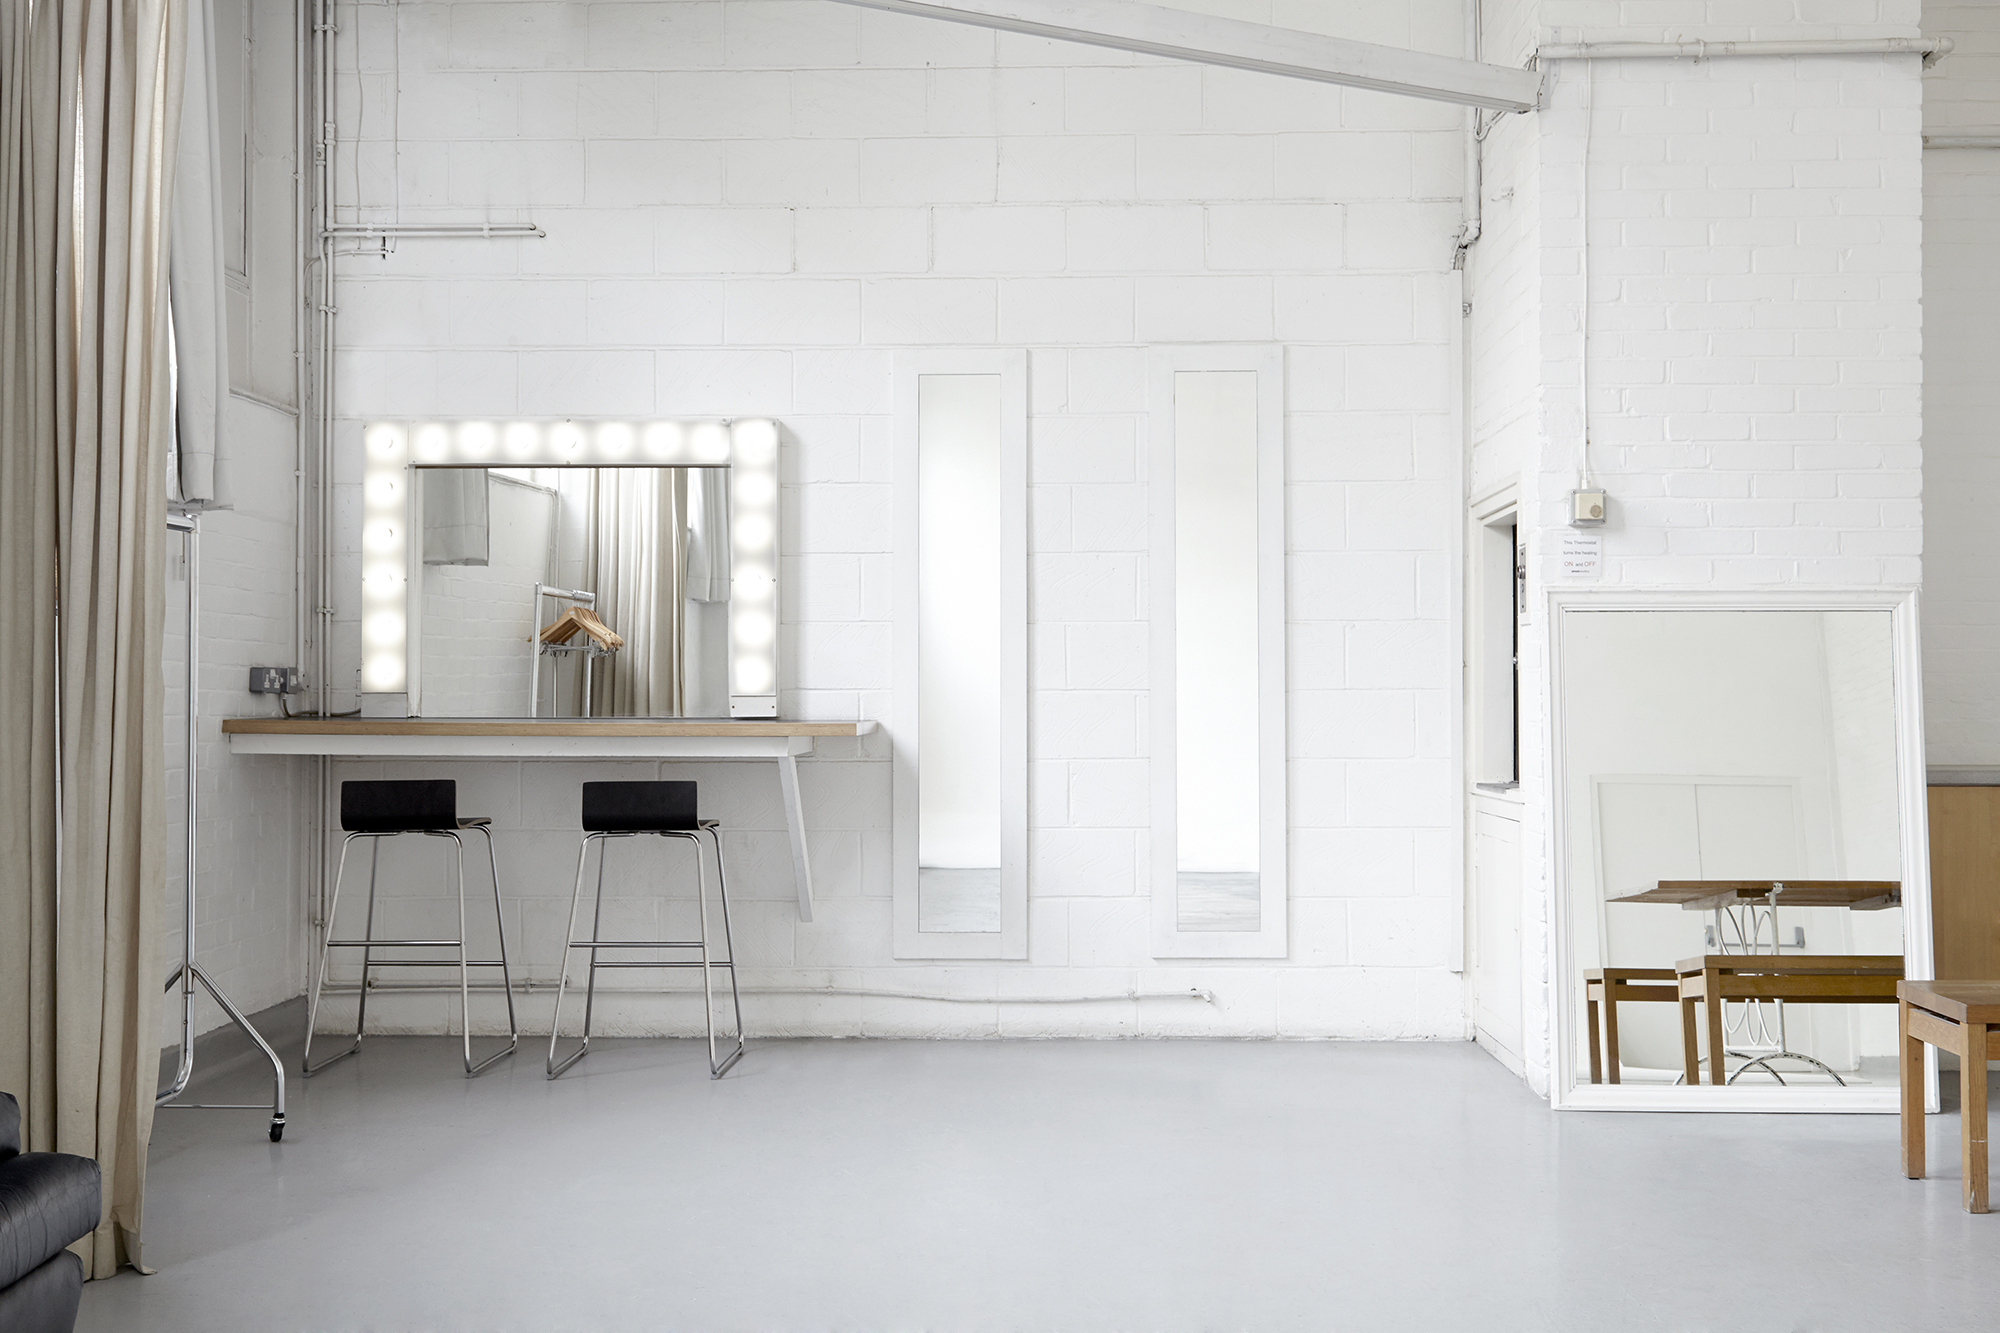 Studio 3 - styling area.jpg